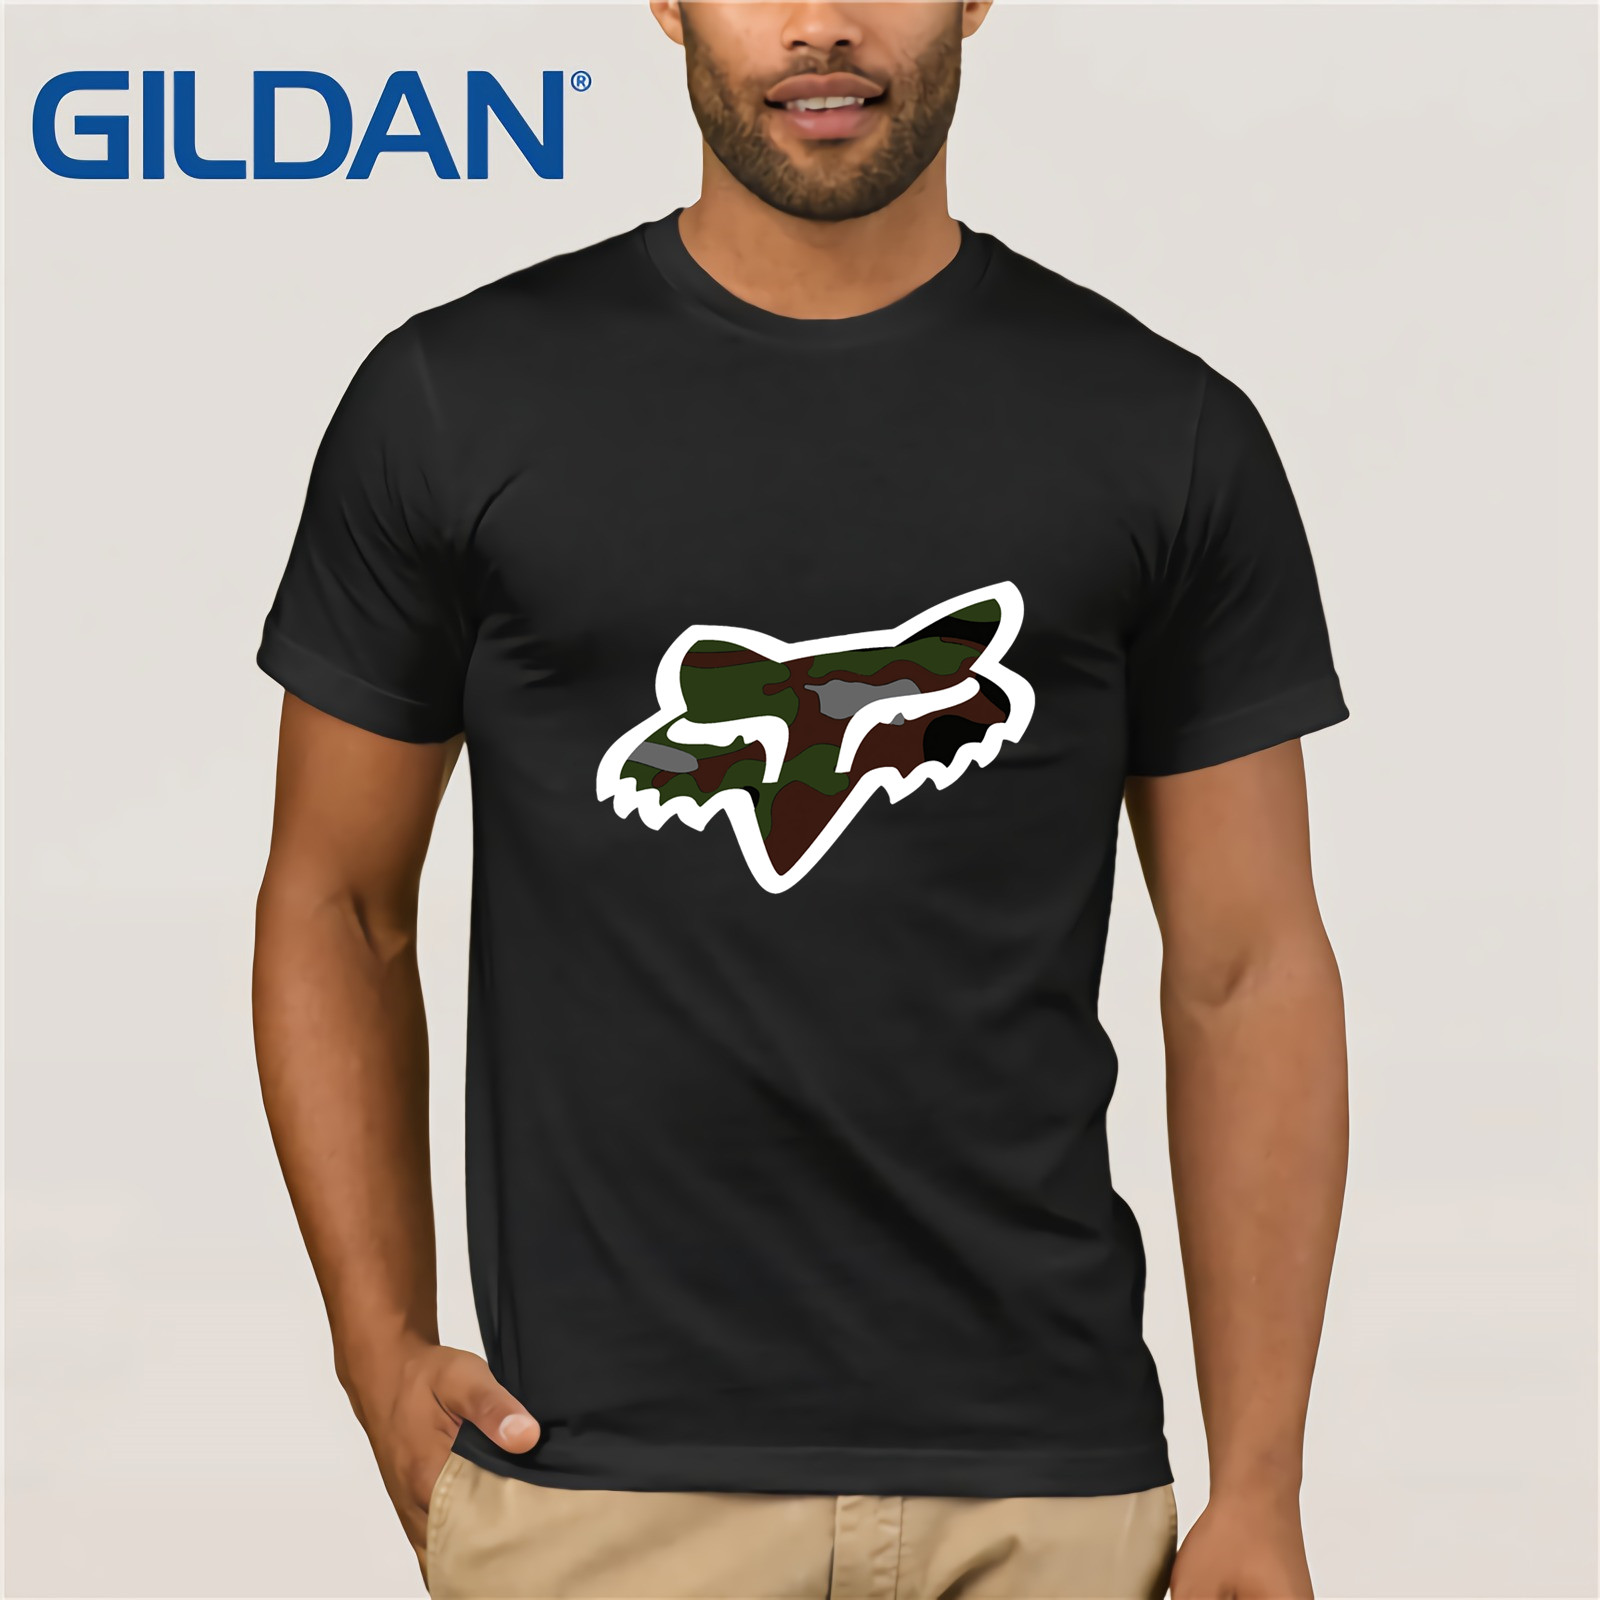 Fox Mtb Ranger Cntr Mens T-shirt - Black All Sizes Mens 2019 Fashion Brand T Shirt O-Neck T-Shirt Tops Tee